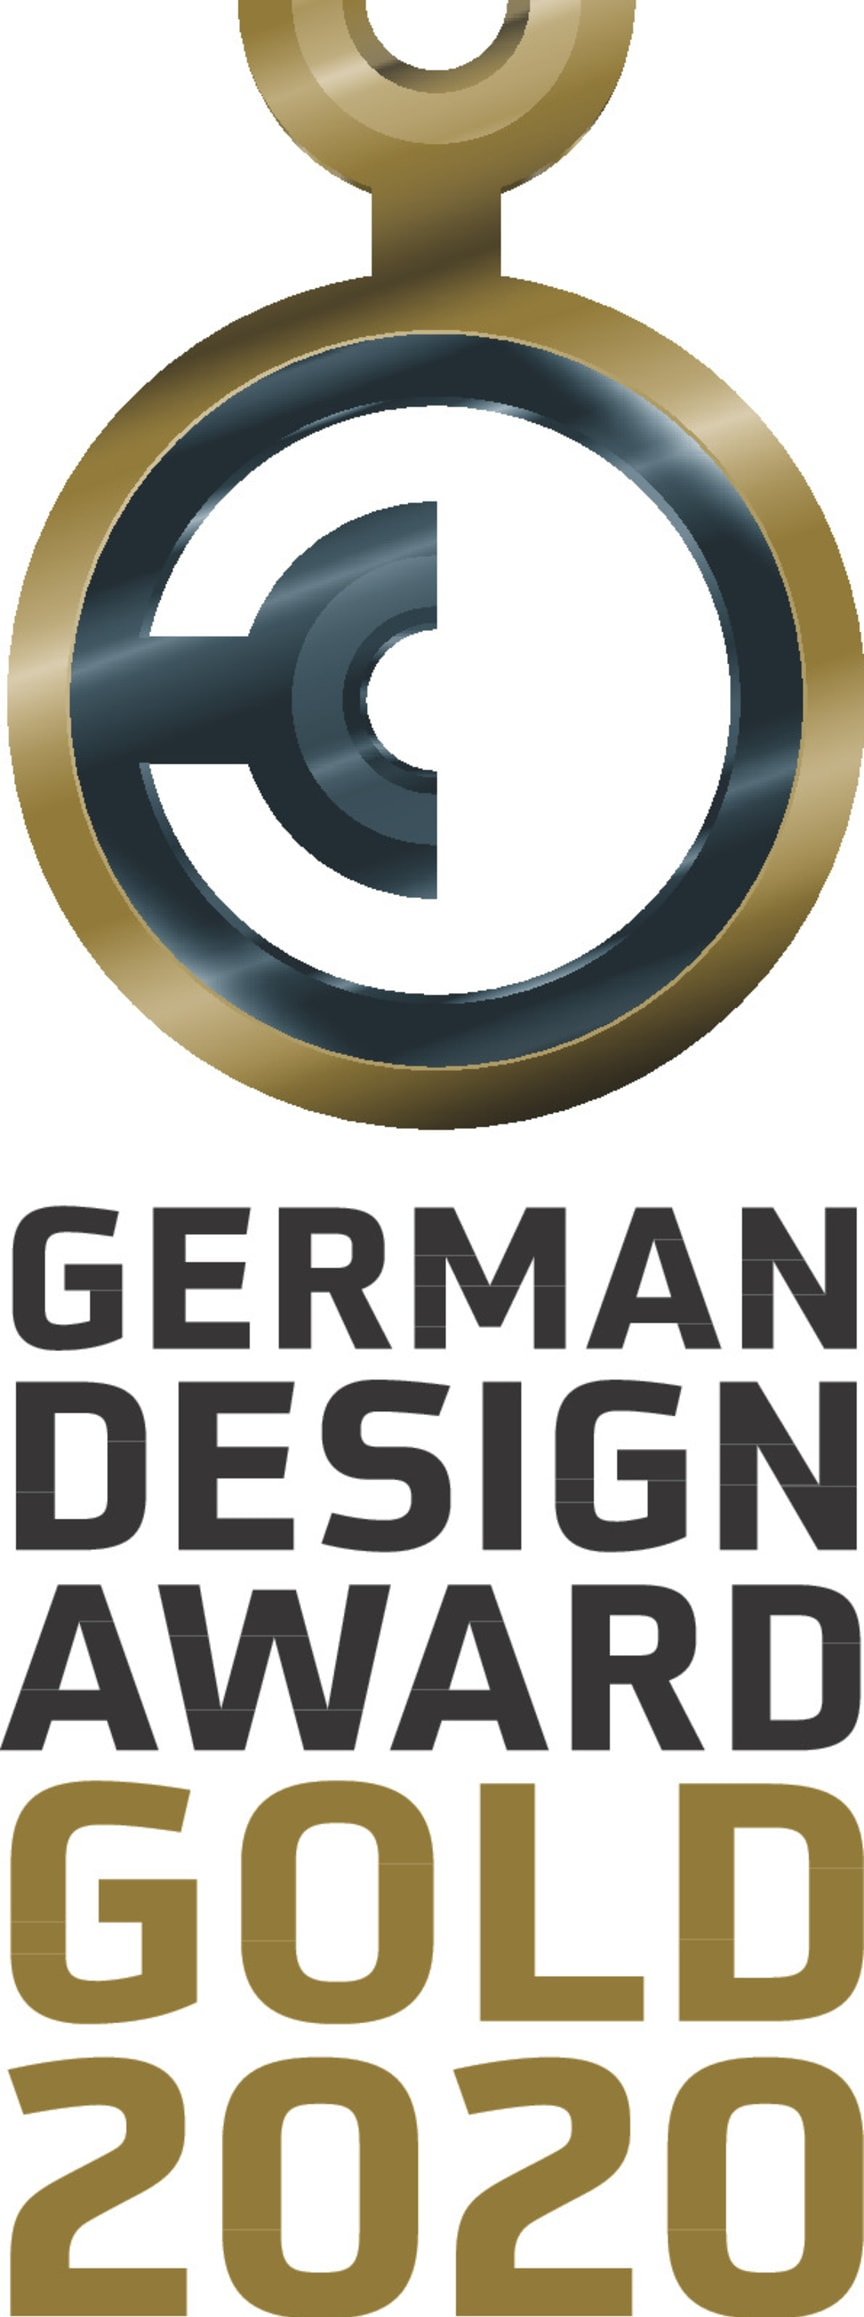 German Design Award GOLD 2020